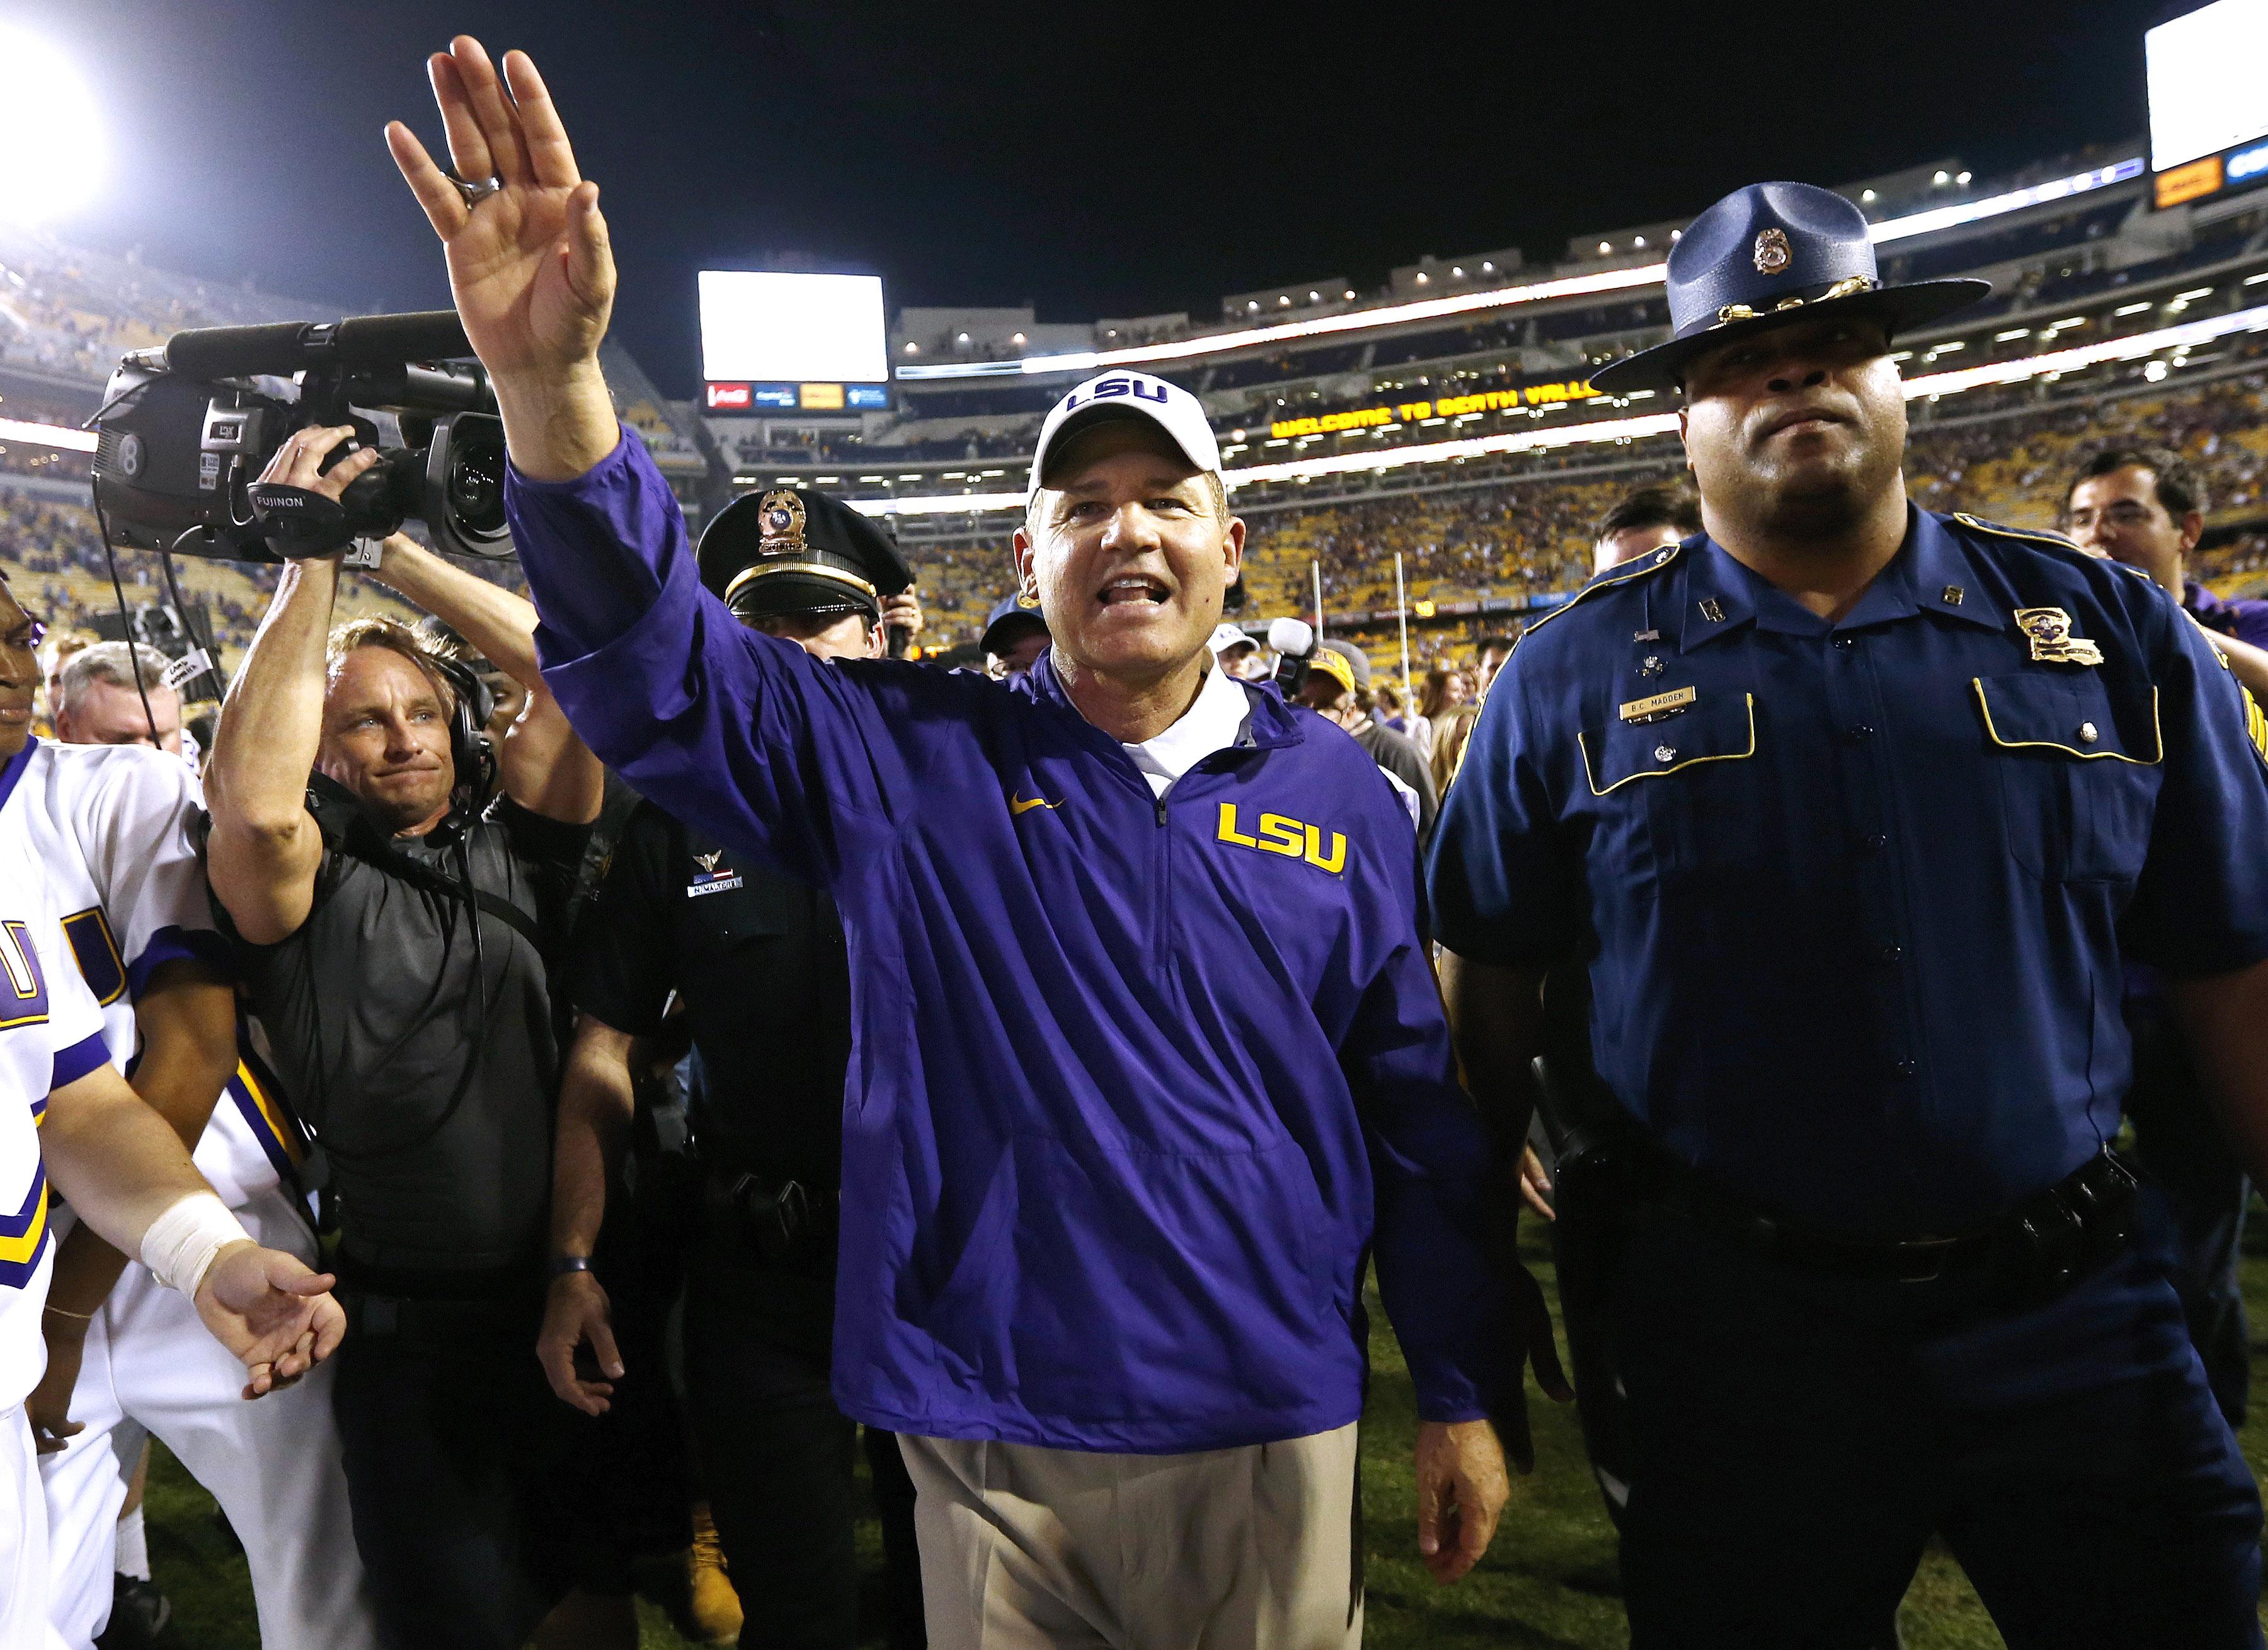 LSU head coach Les Miles celebrates after an NCAA college football game against Texas A&M in Baton Rouge, La., Saturday, Nov. 28, 2015. LSU won 19-7. (AP Photo/Jonathan Bachman)